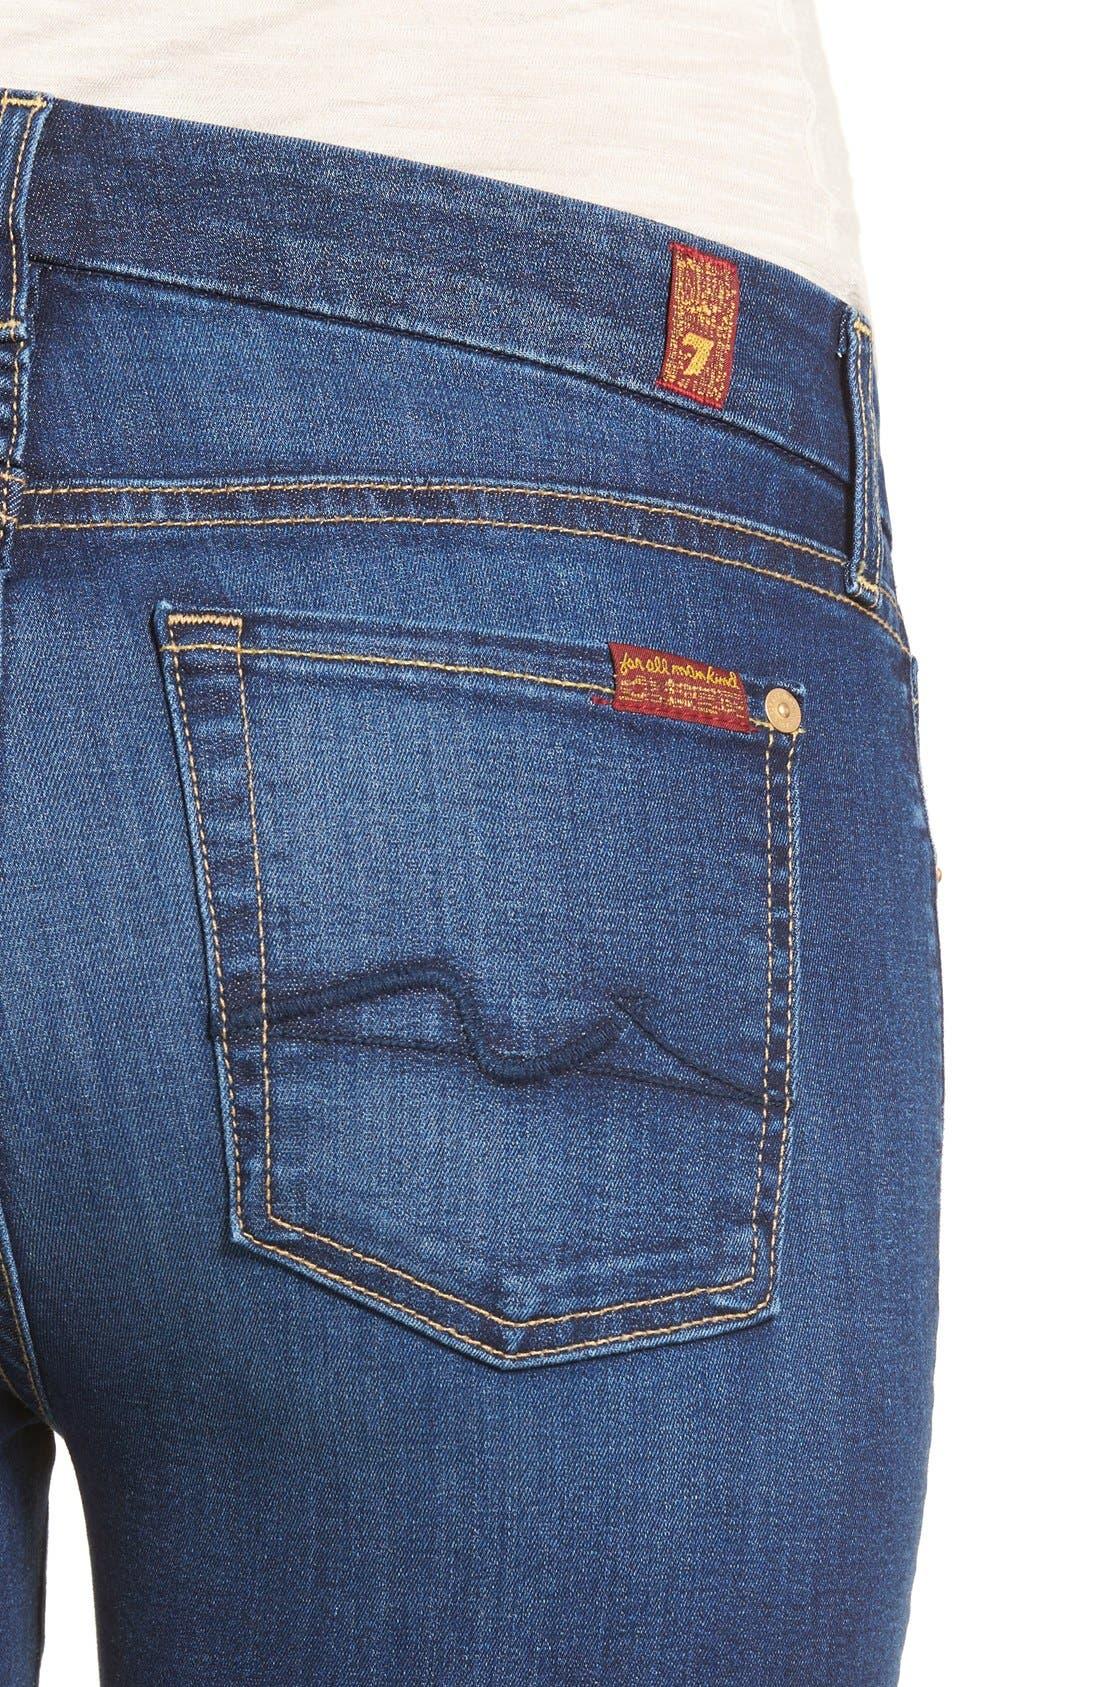 7 FOR ALL MANKIND<SUP>®</SUP>, b(air) Kimmie Straight Leg Jeans, Alternate thumbnail 4, color, DUCHESS